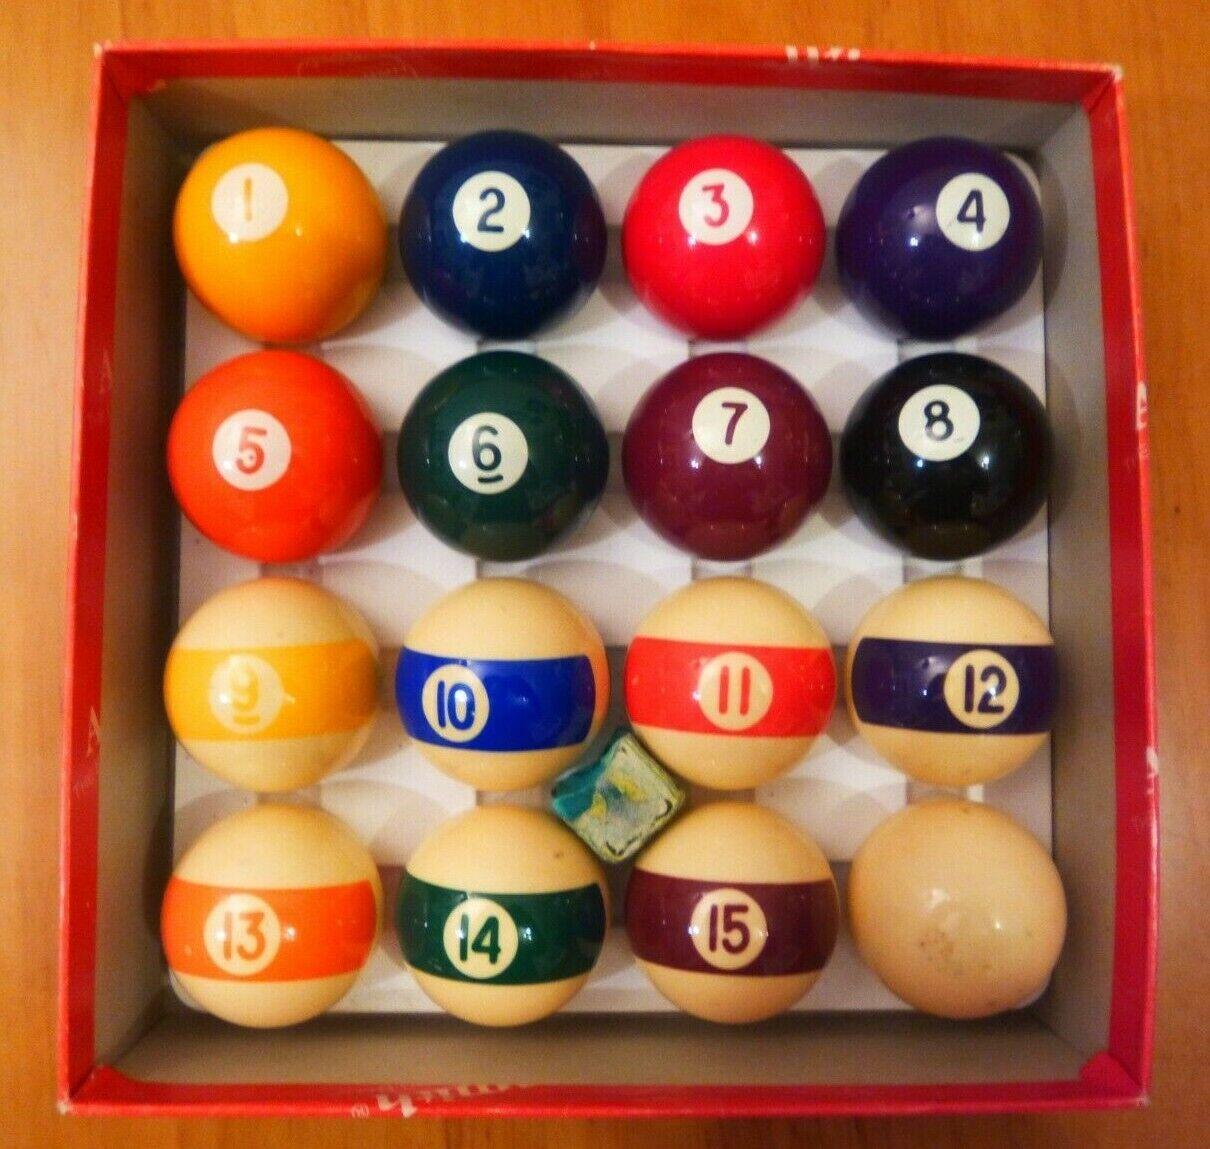 ARAMITH SPOTS and STRIPES POOL BALL SET 1 7/8